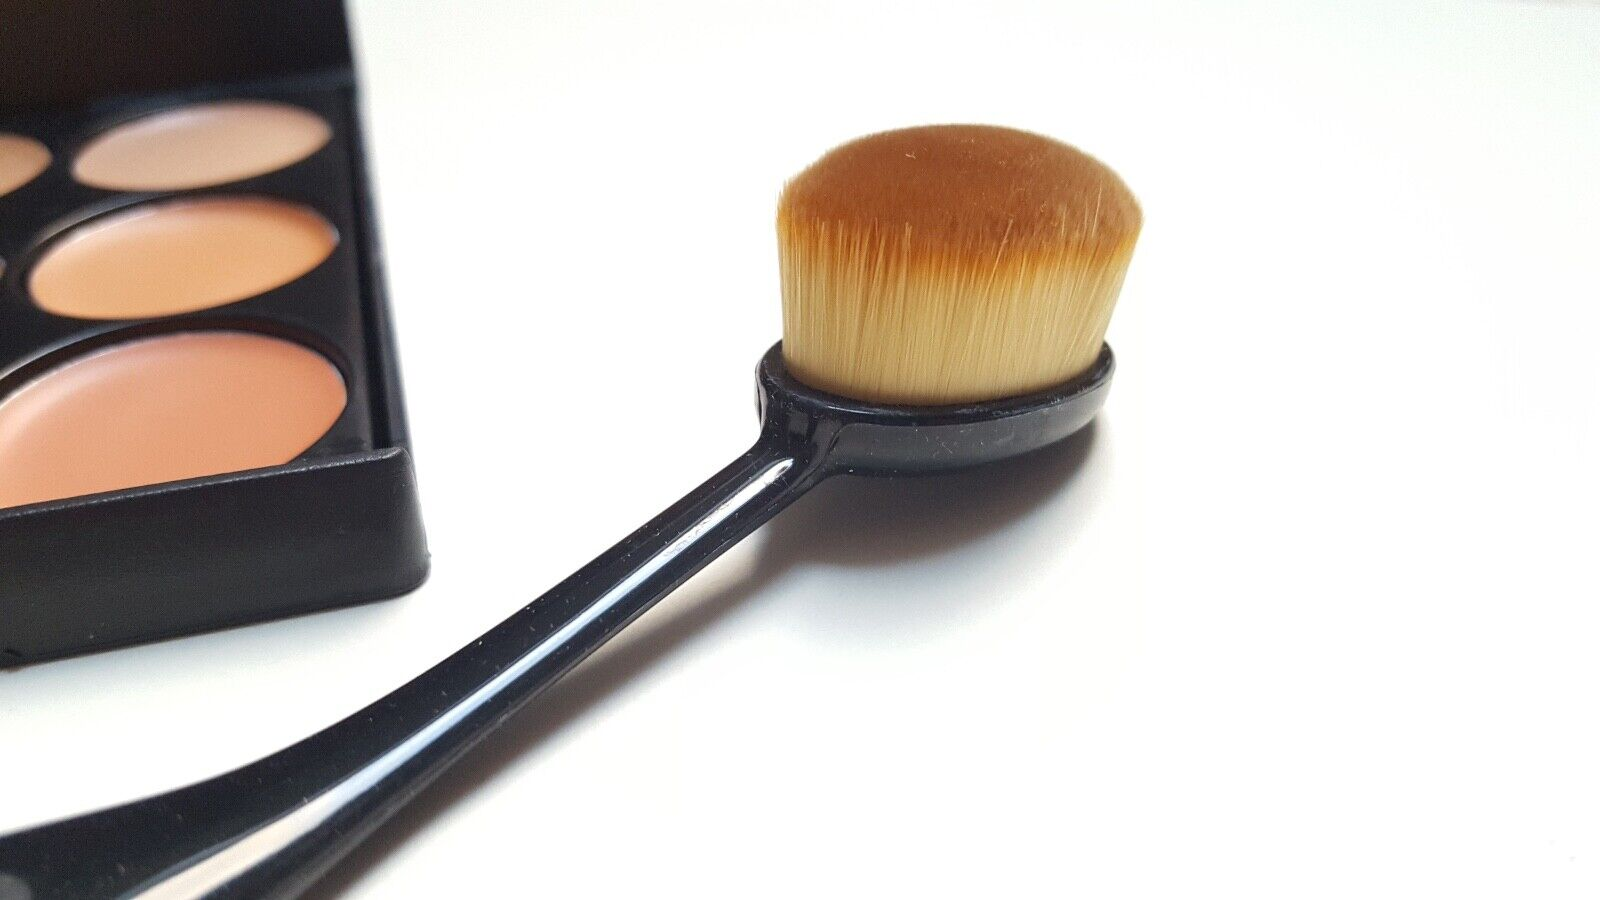 Oval Pinsel Make Up Foundation Profi Pinsel